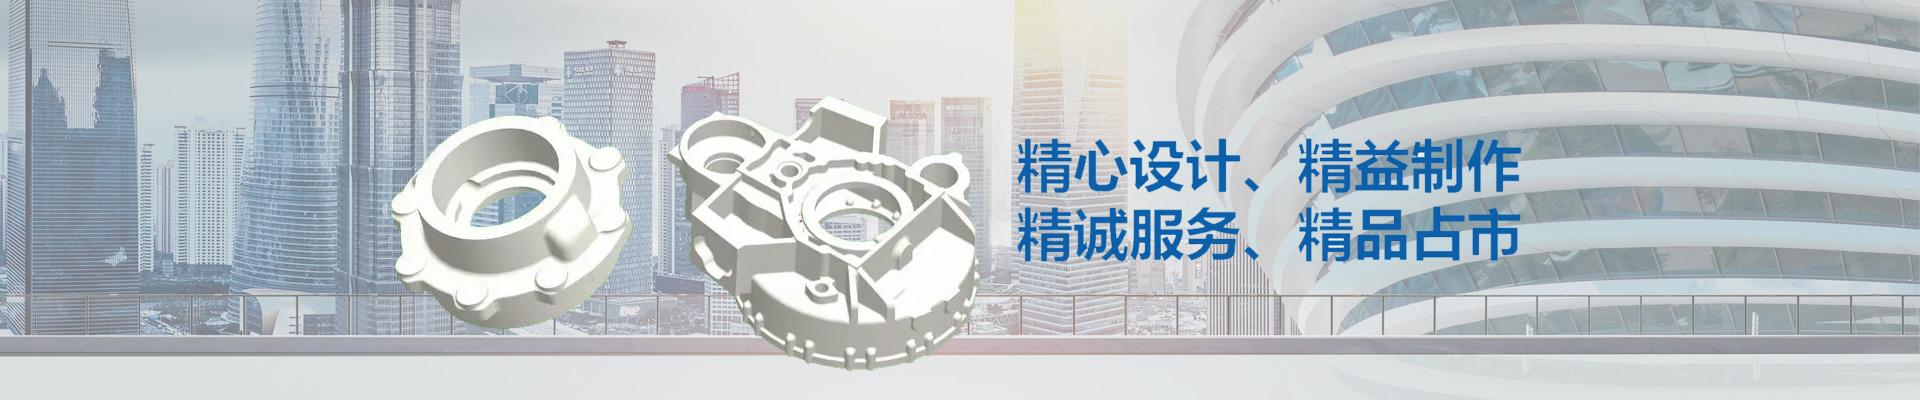 http://static.xypt.net.cn/cbe673e6/21/07/366fe379f3b6dadd0d7c3dc1a00489e2ecd21dbc.jpg